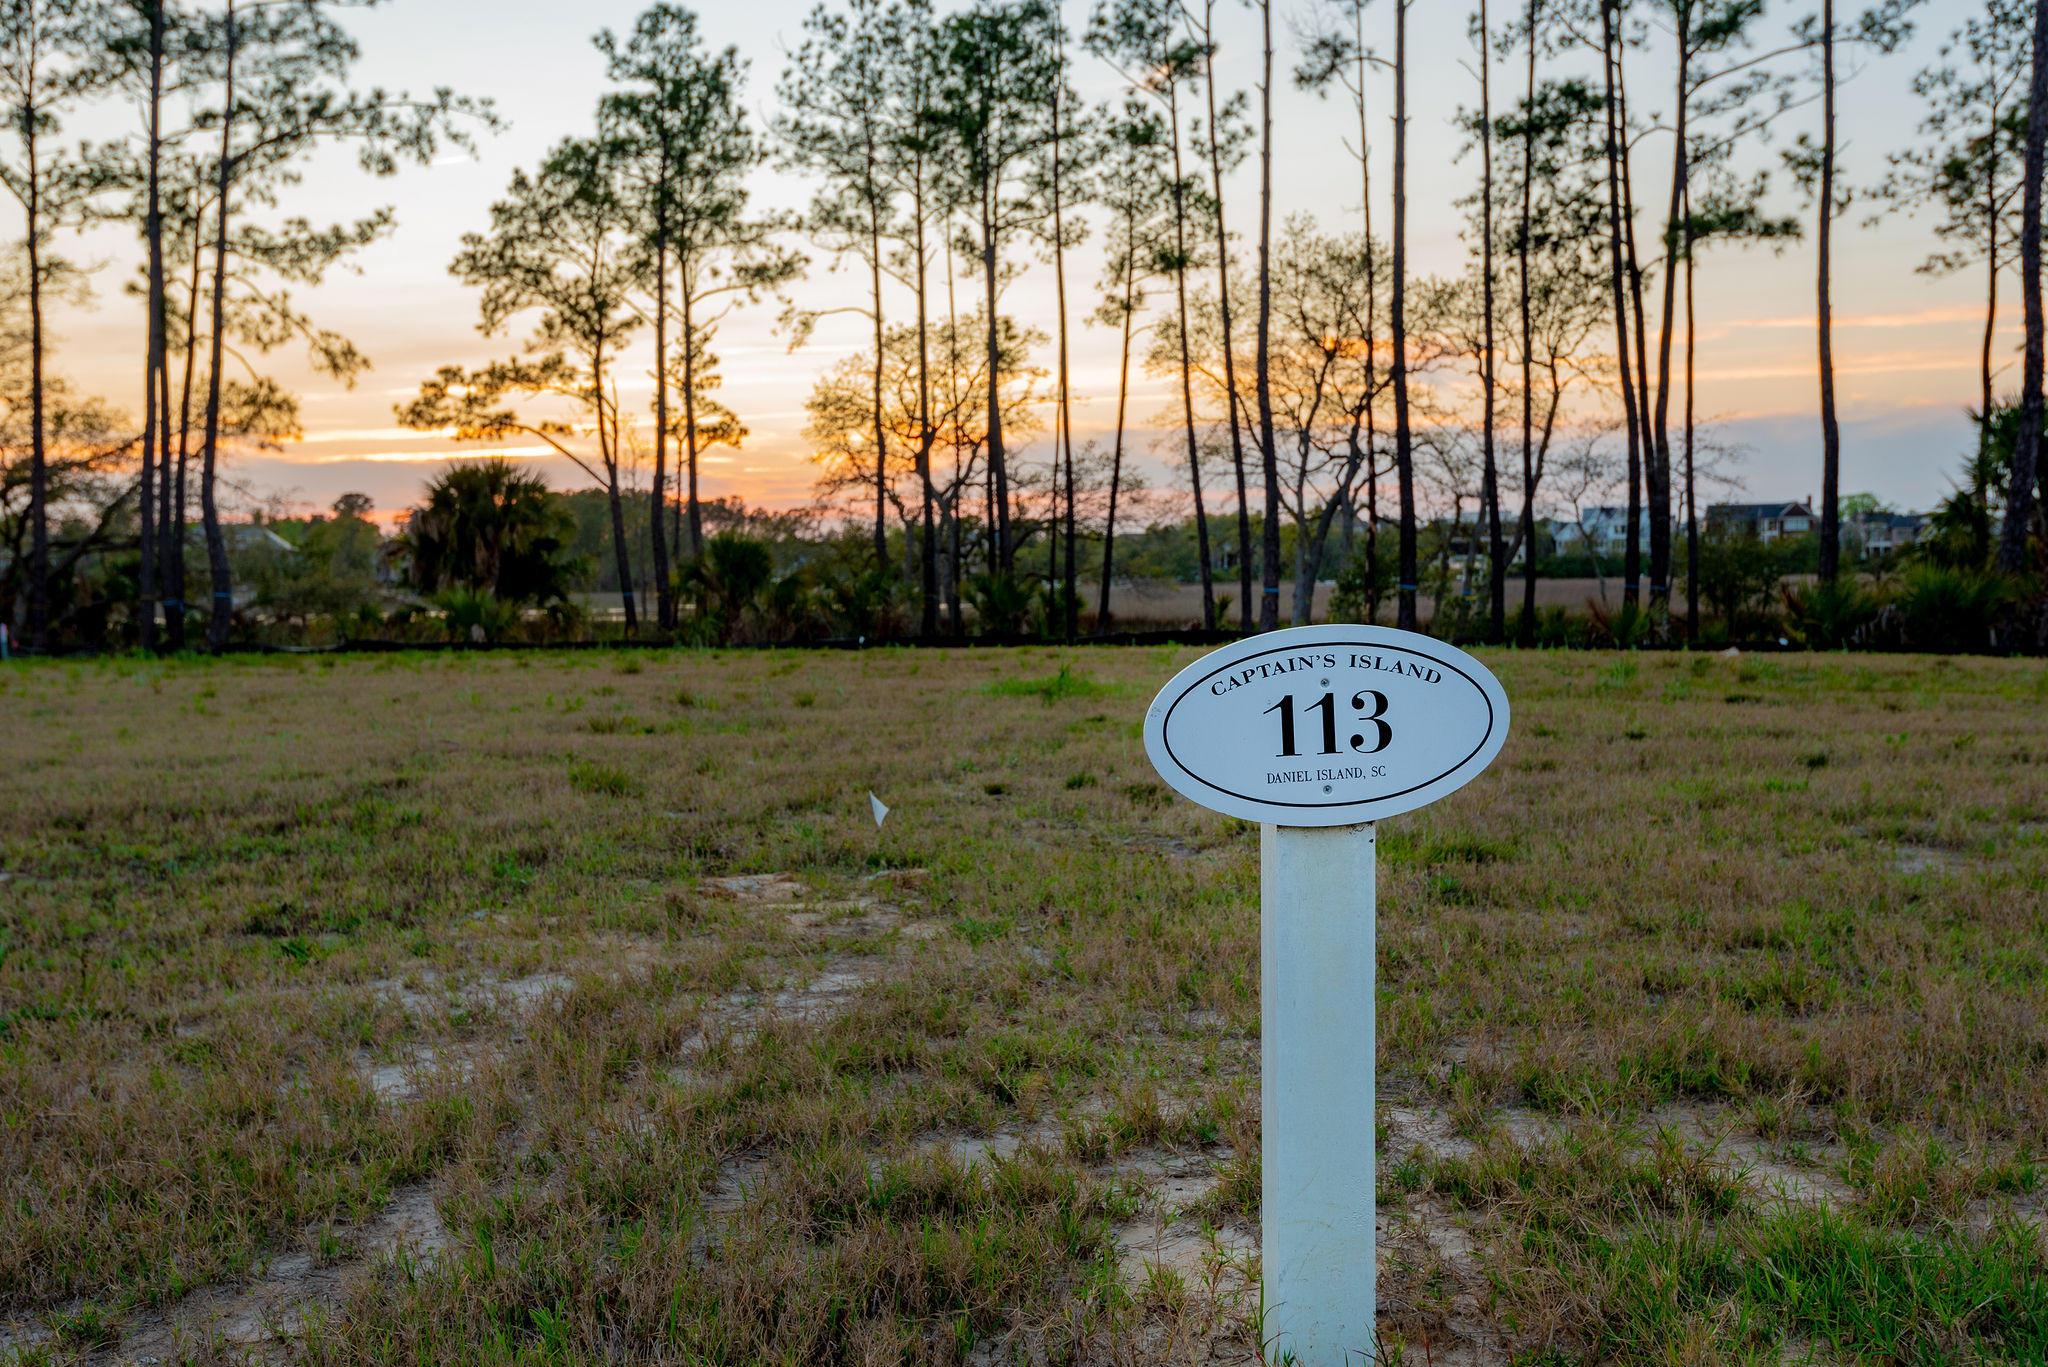 Daniel Island Park Homes For Sale - 113 Captains Island, Charleston, SC - 0